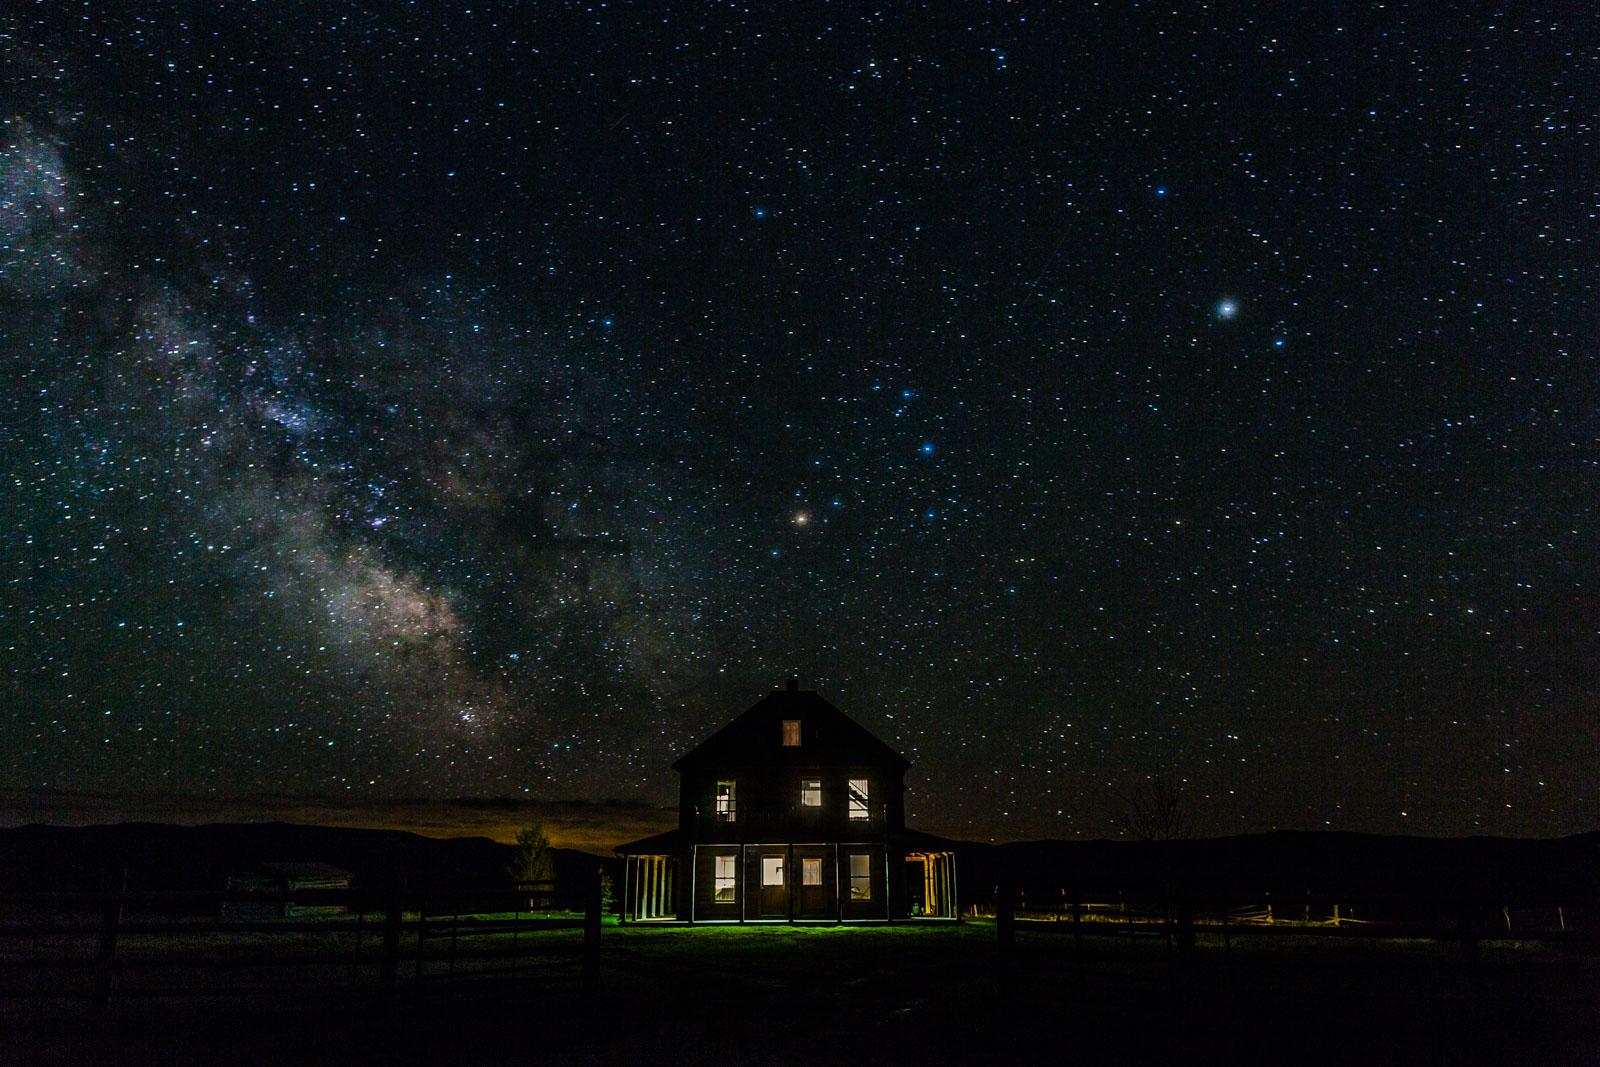 Night photography, J Bar L Ranch, Montana, USA